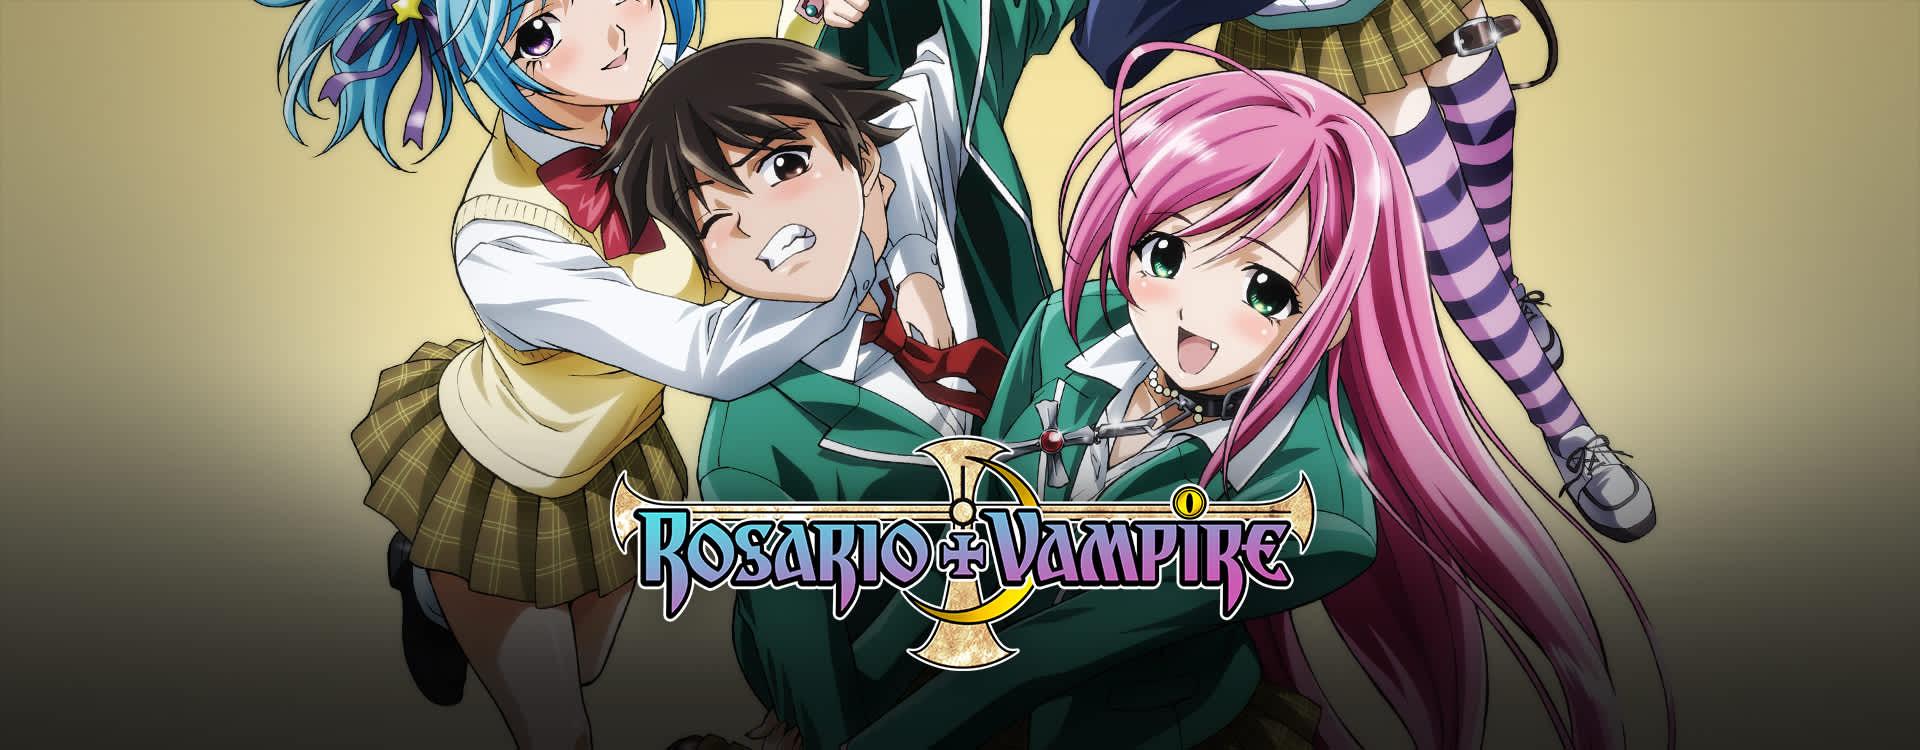 porn vampire Anime rosario